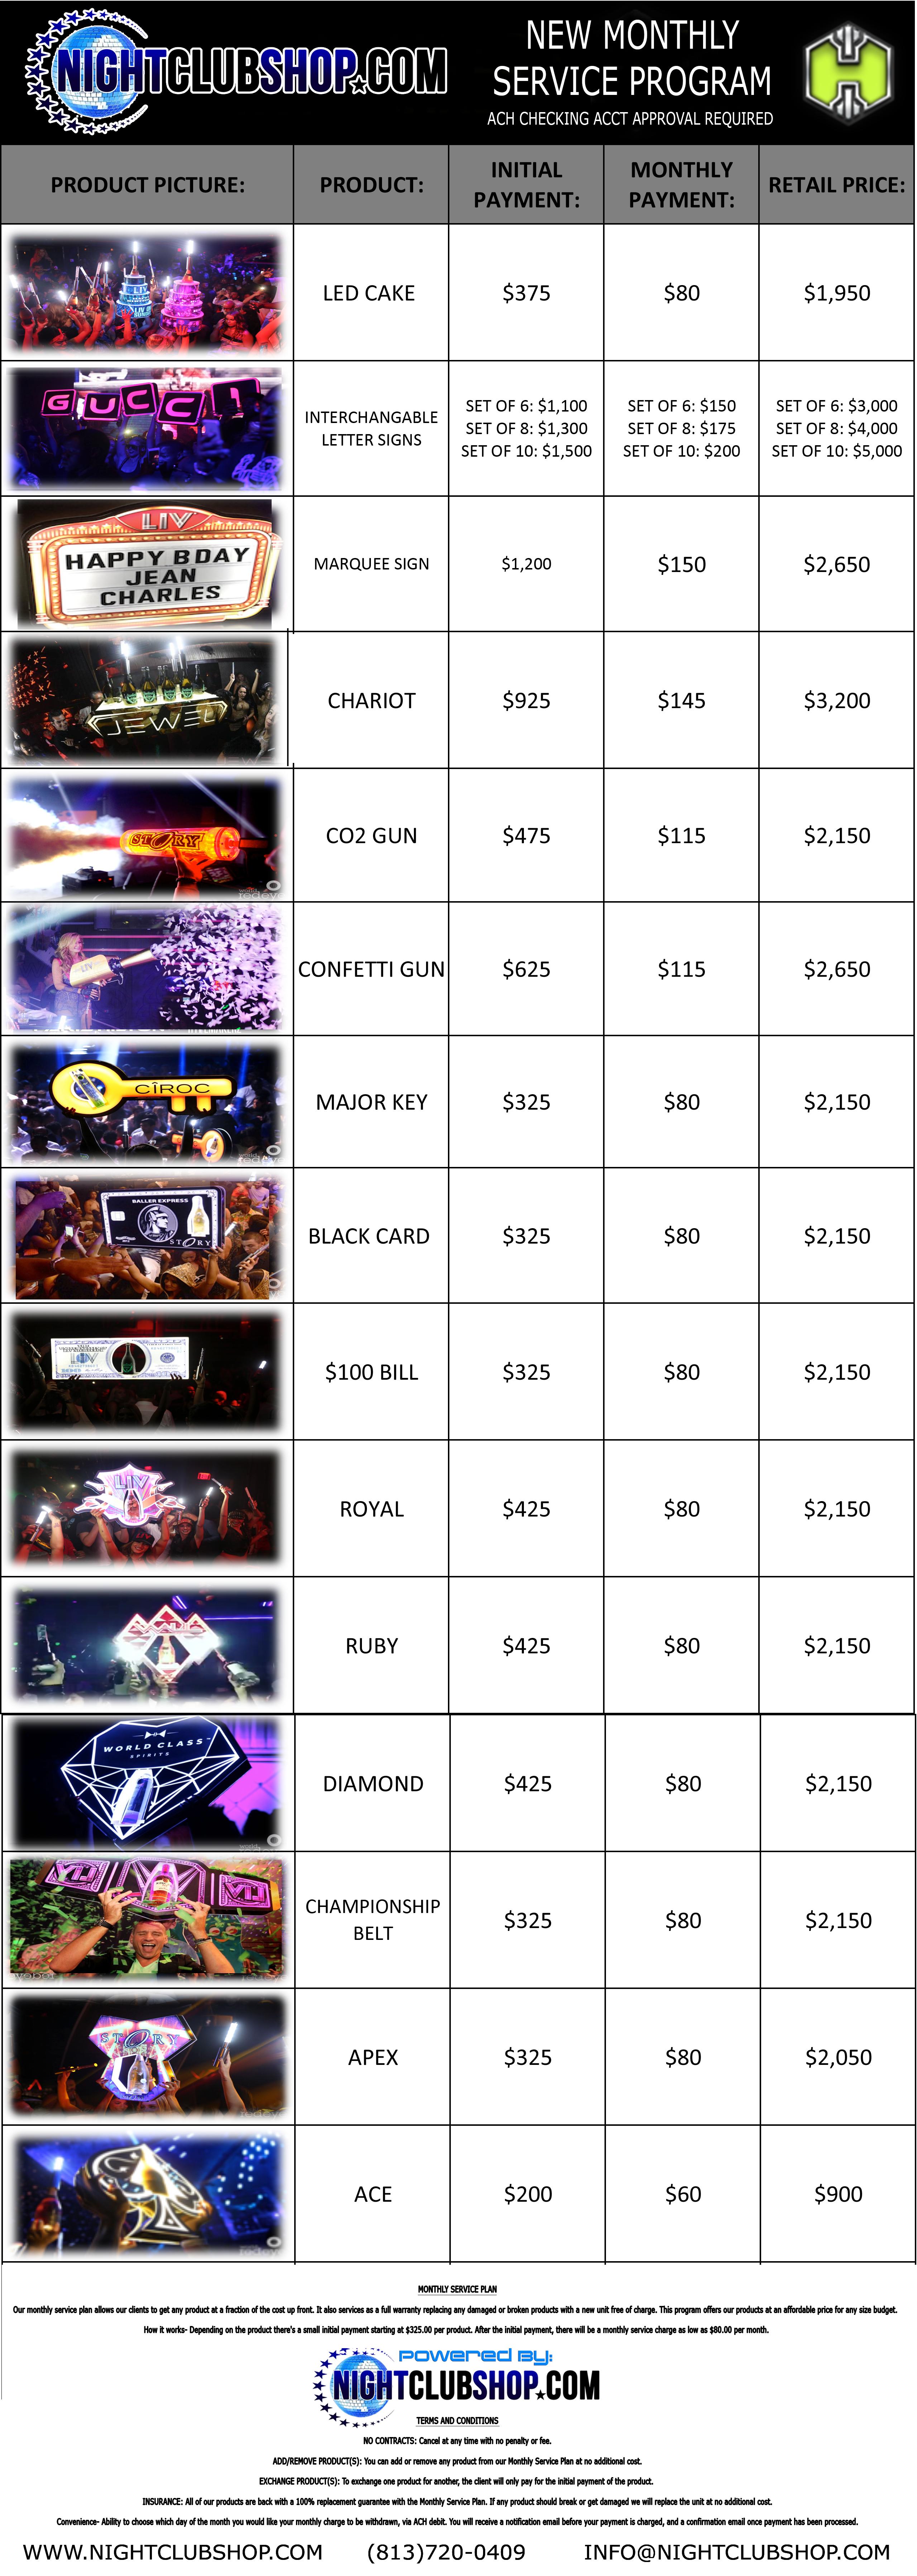 nightclubshop.com-vip-monthly-service-price-guide.jpg